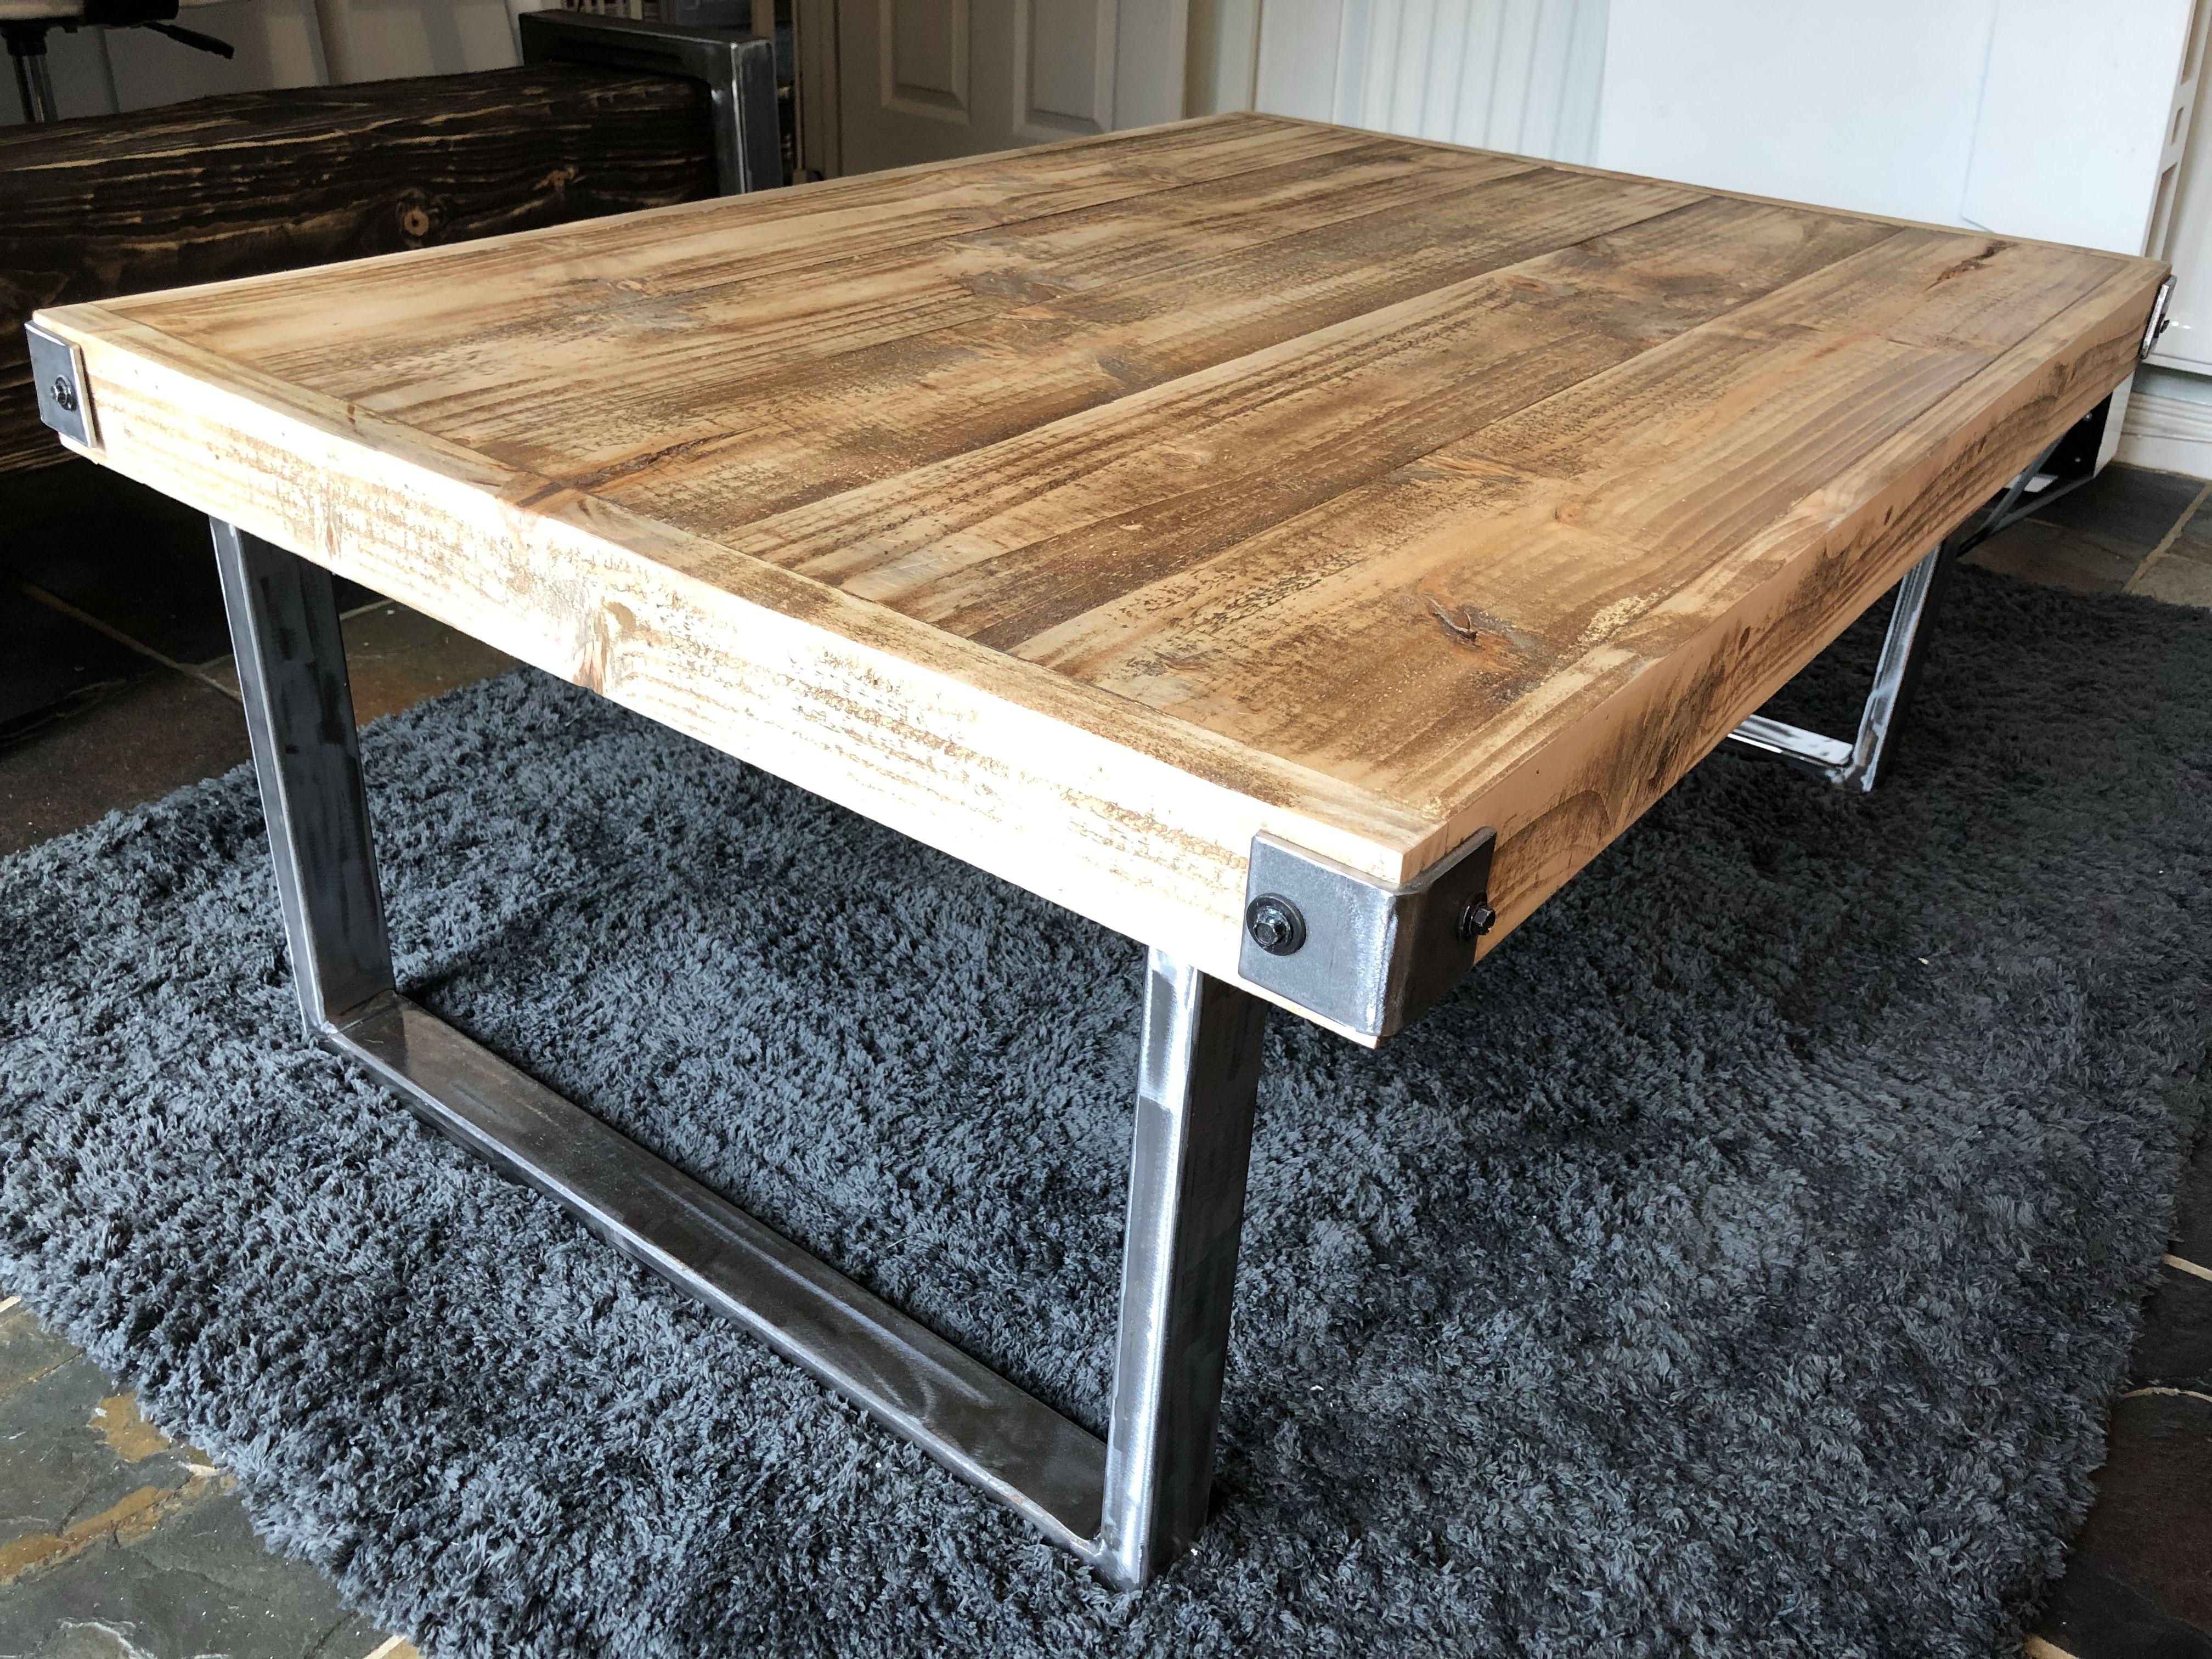 Reclaimed Wood Coffee Table Coffee Table Wood Reclaimed Wood Coffee Table Reclaimed Wood Table [ 3024 x 4032 Pixel ]